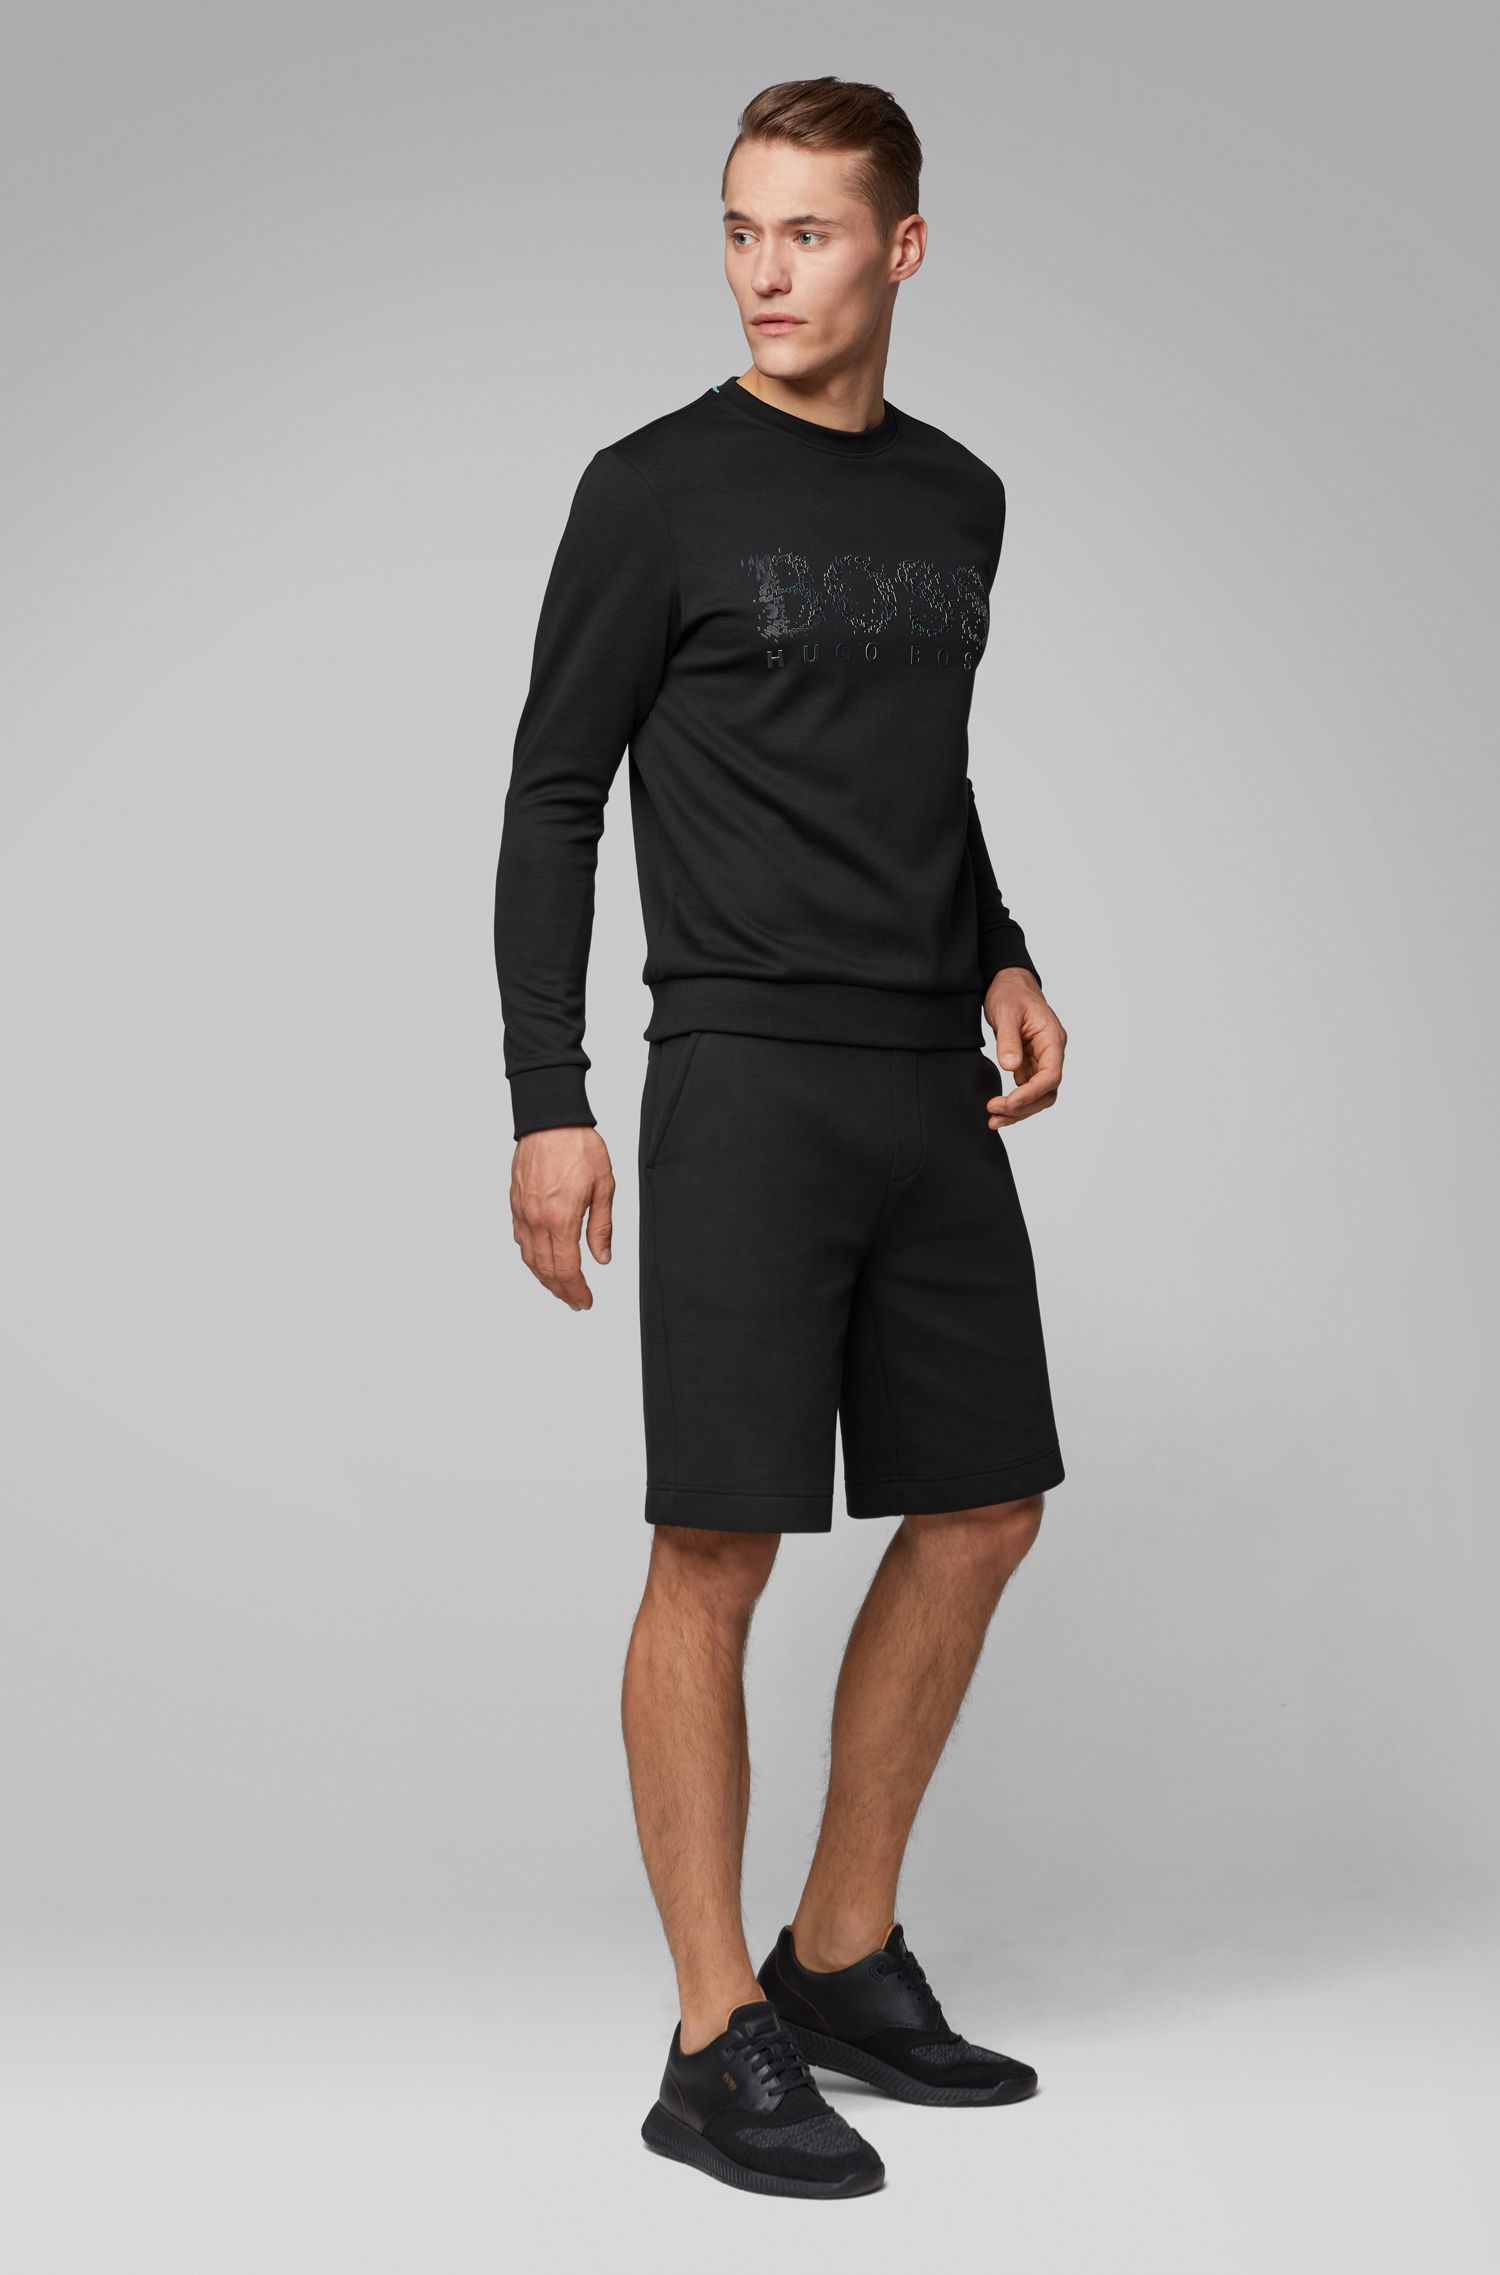 Slim-fit sweatshirt with seasonal logo artwork, Black